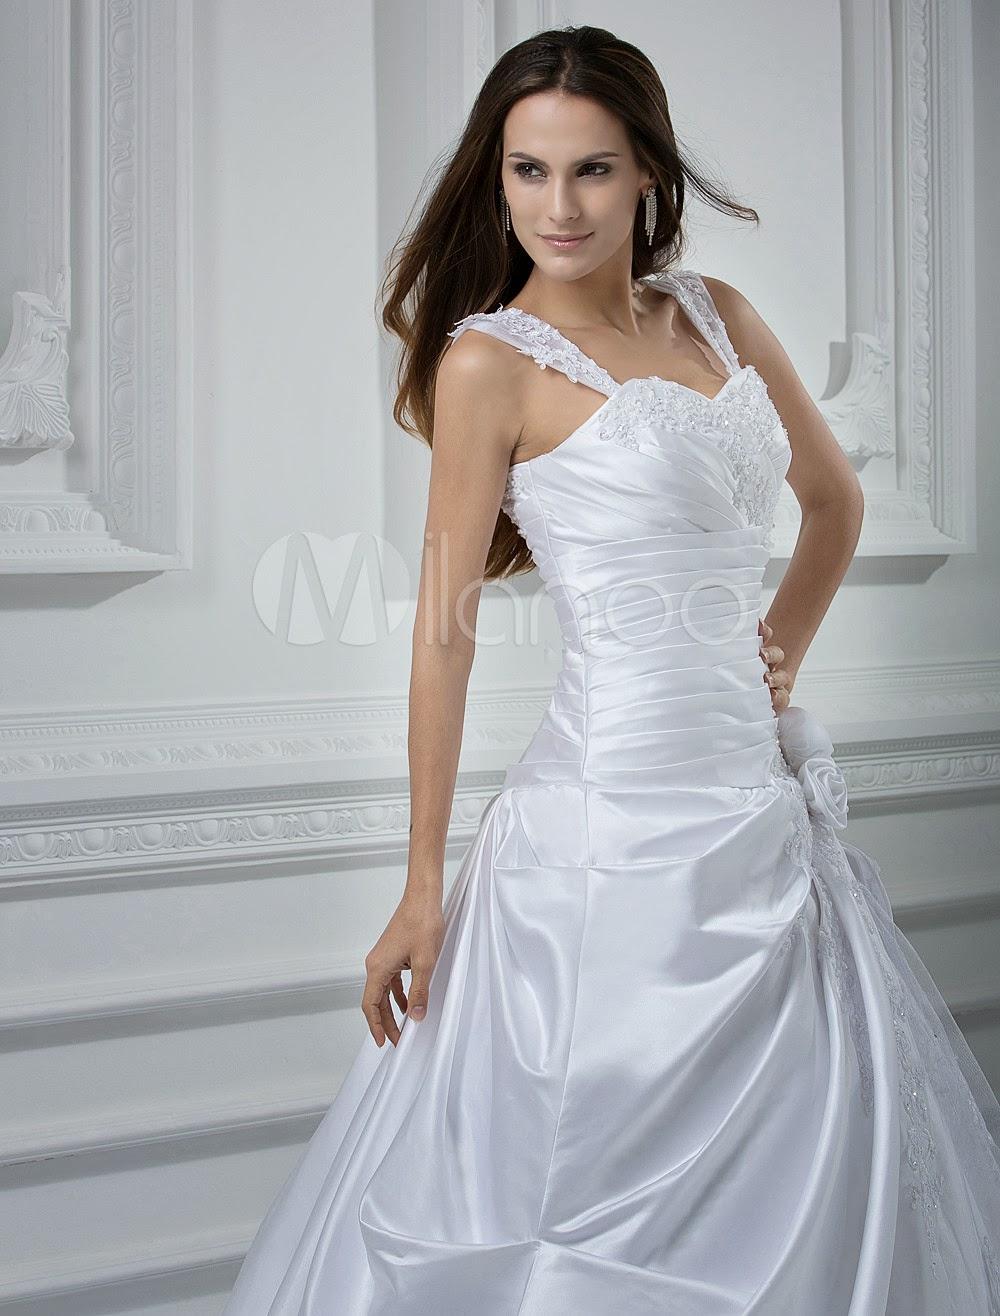 China Wholesale Dresses - Lace White A-line Sweetheart Beading Applique Satin Luxury Wedding Dress